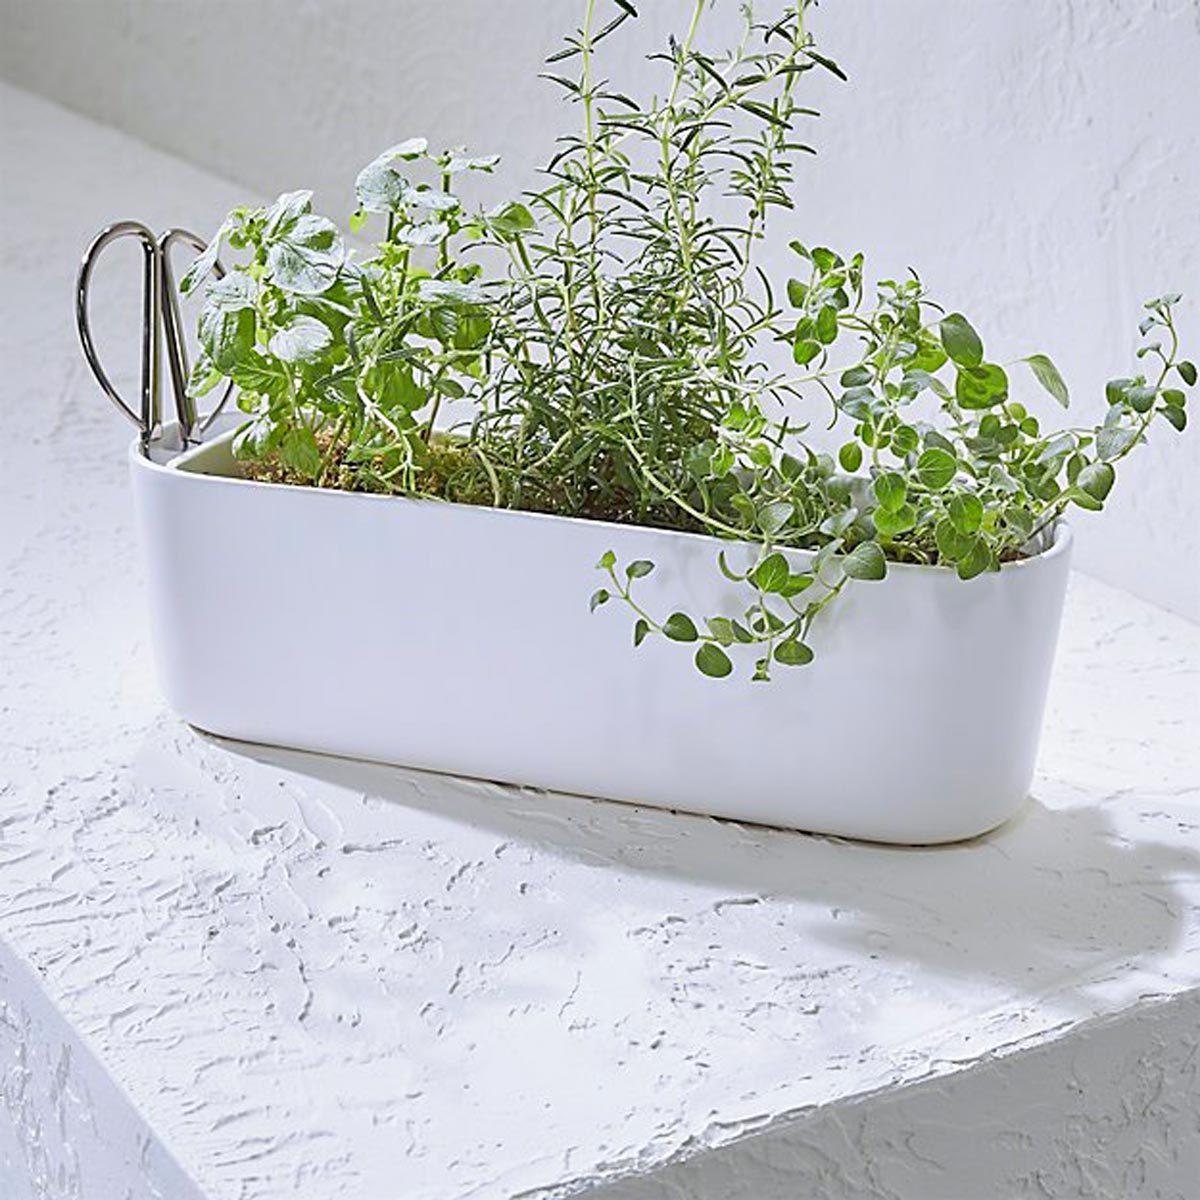 Herb Planter with Scissors